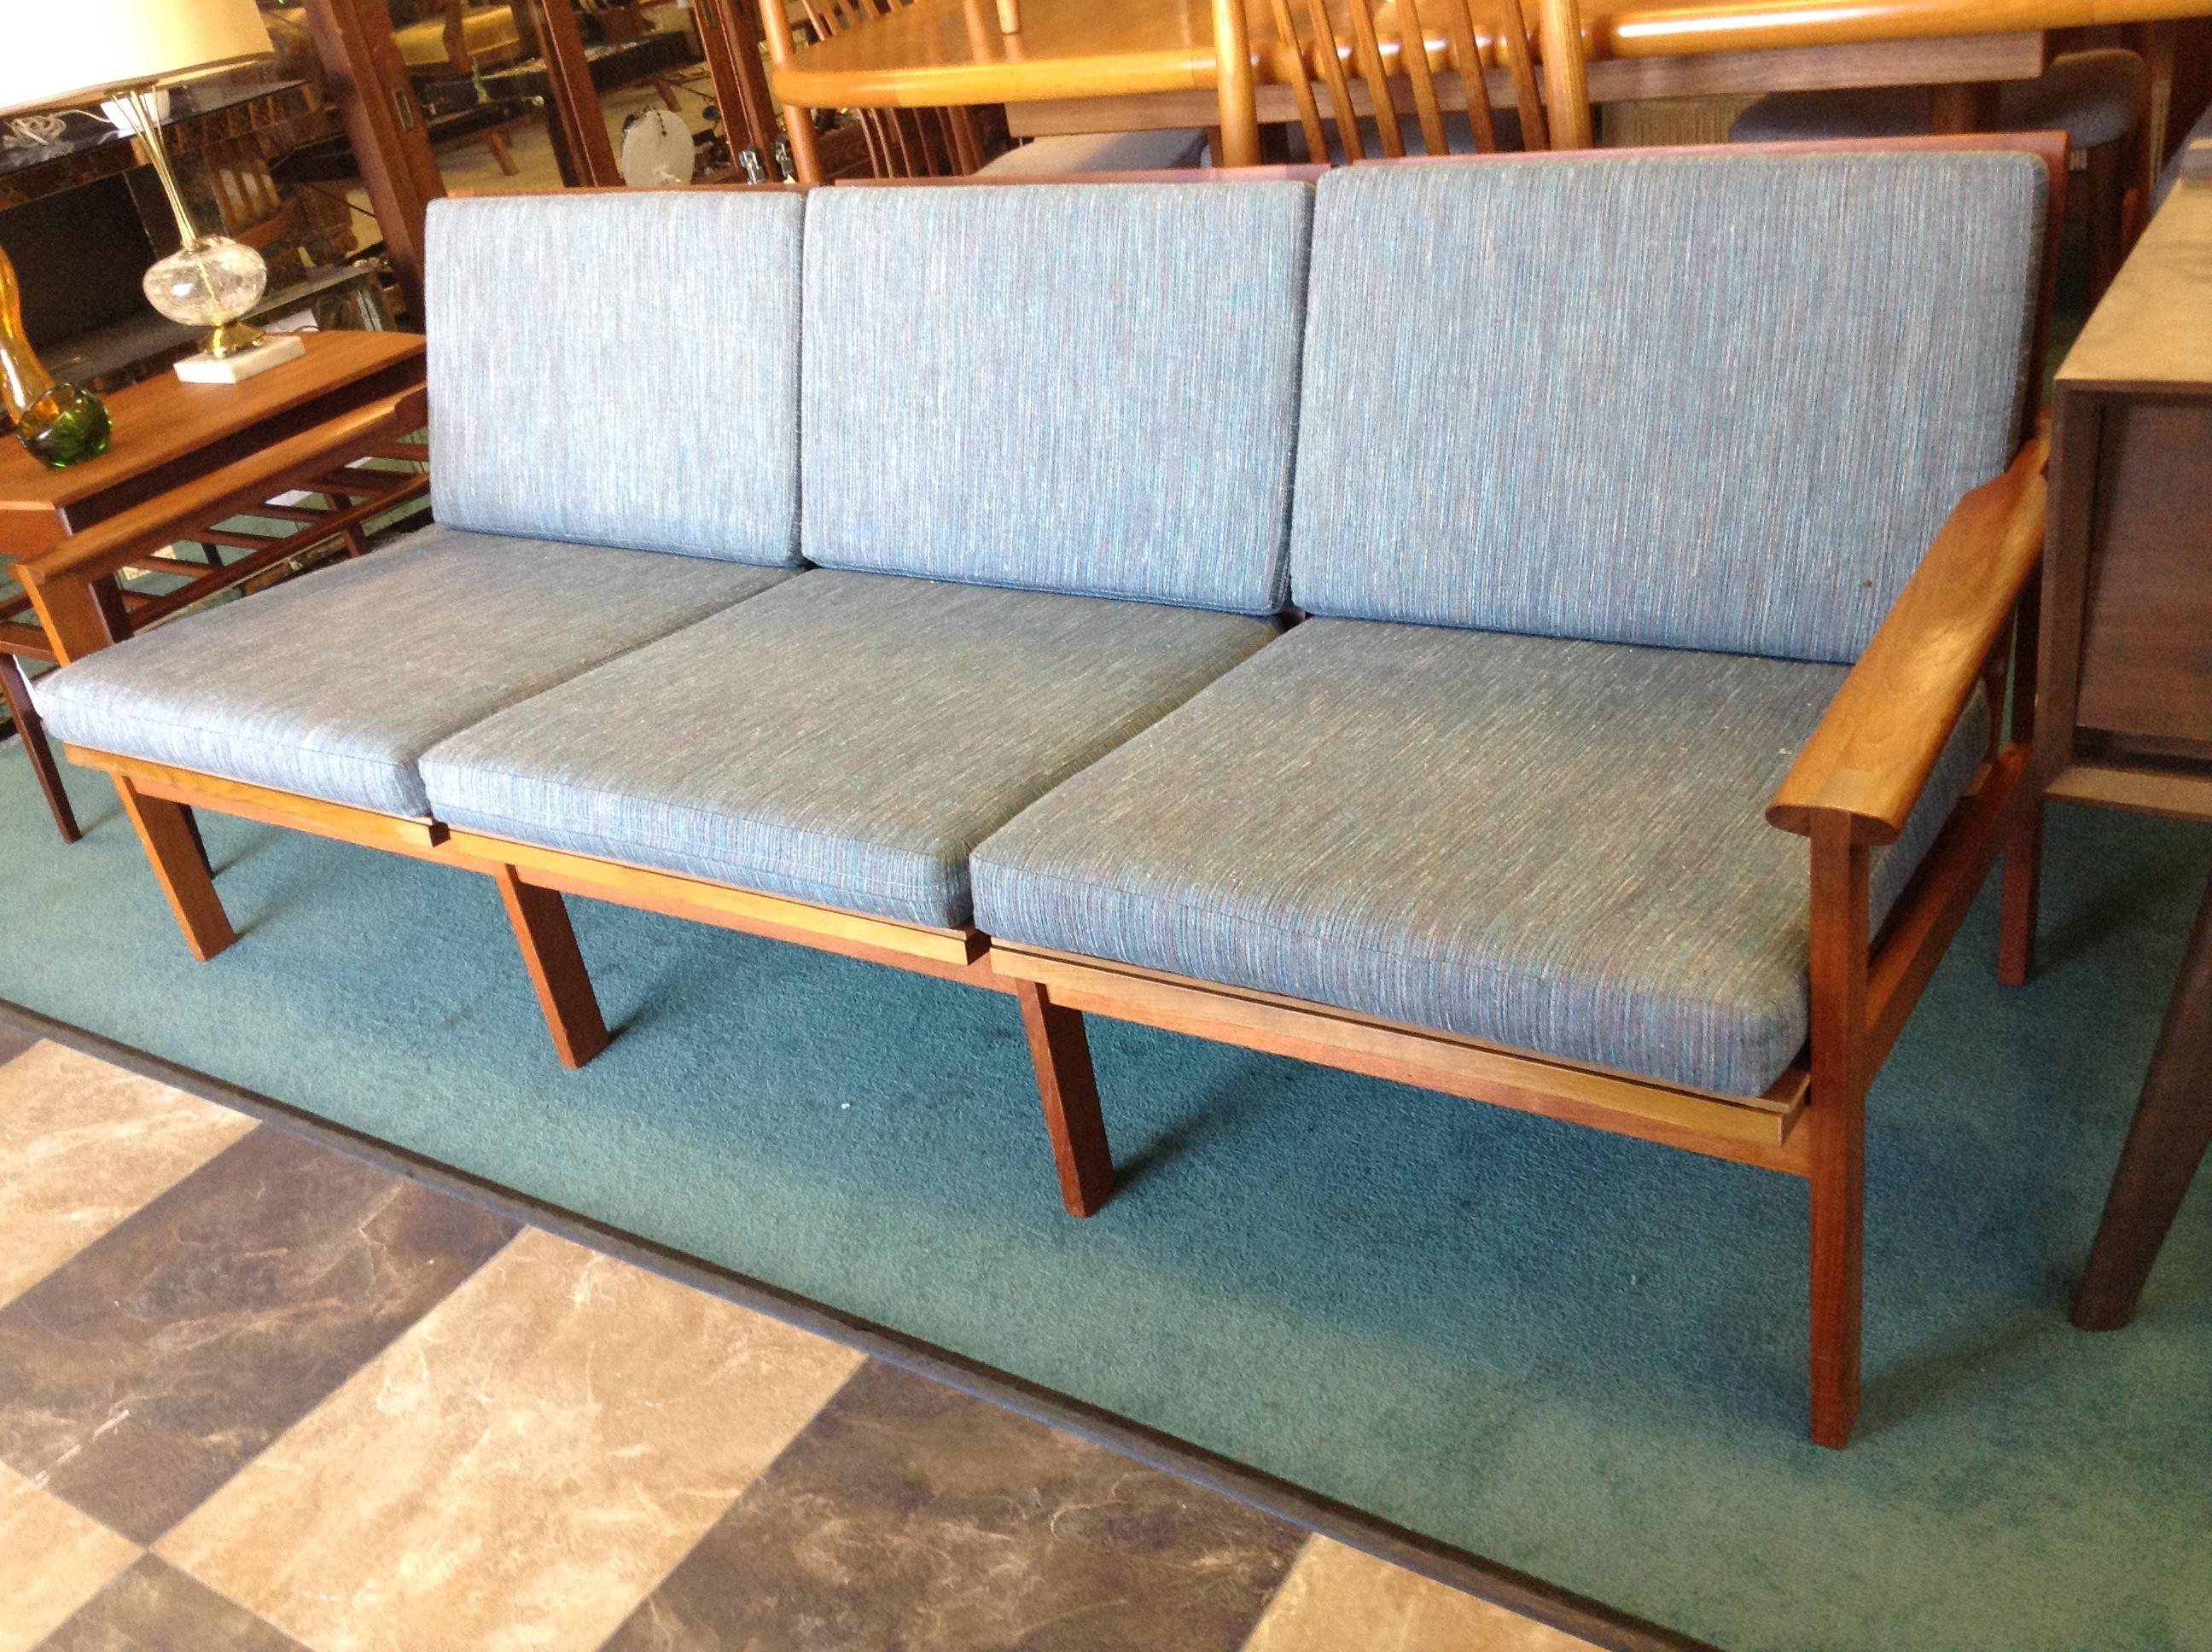 Thrift City Furniture image 8